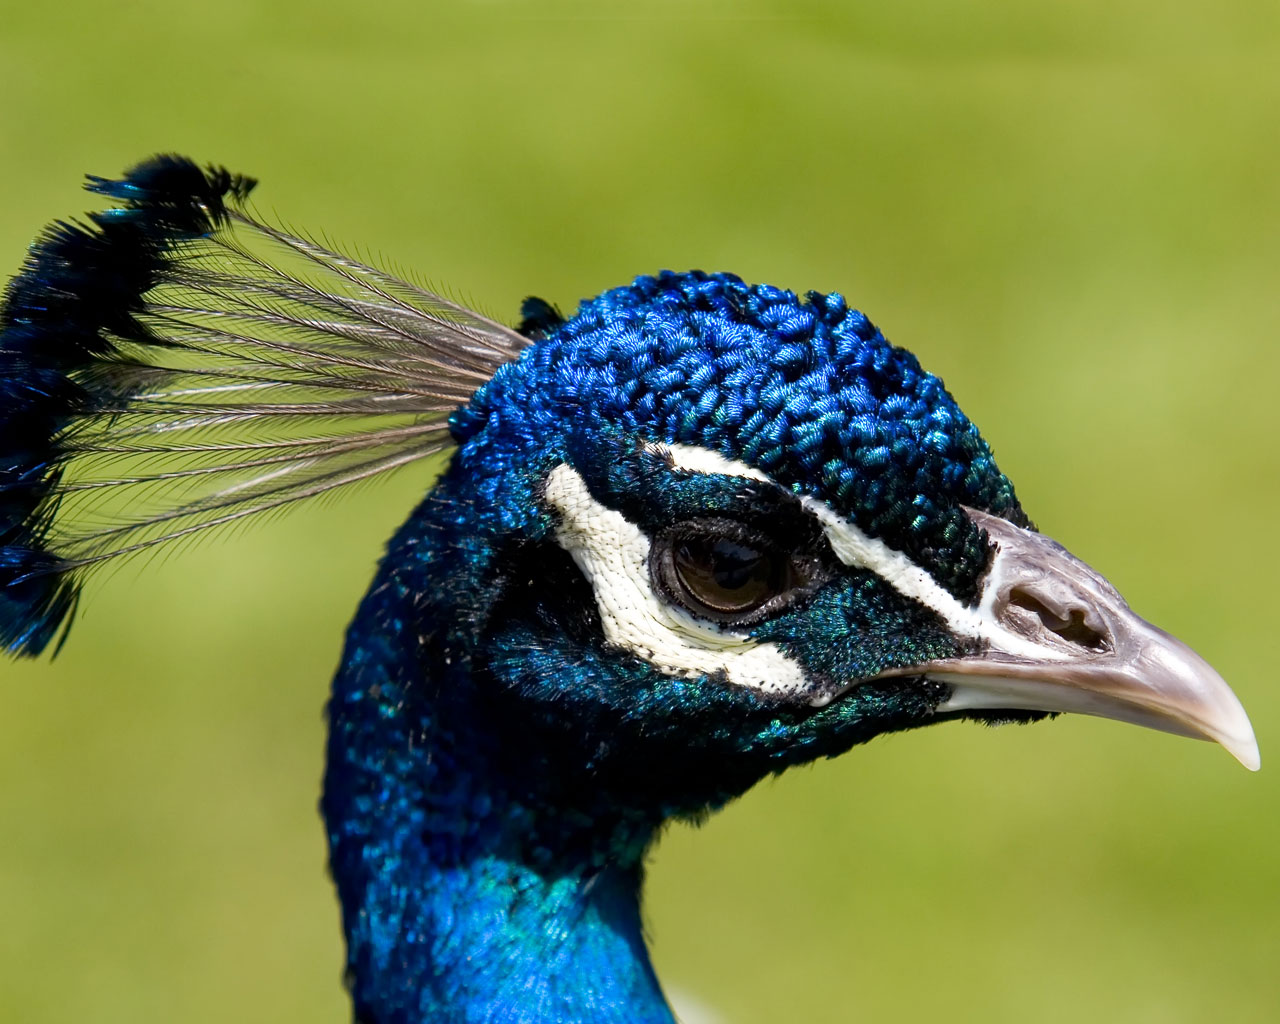 Desktop Nature wallpaper: Indian Blue Peacock Free ... - photo#10